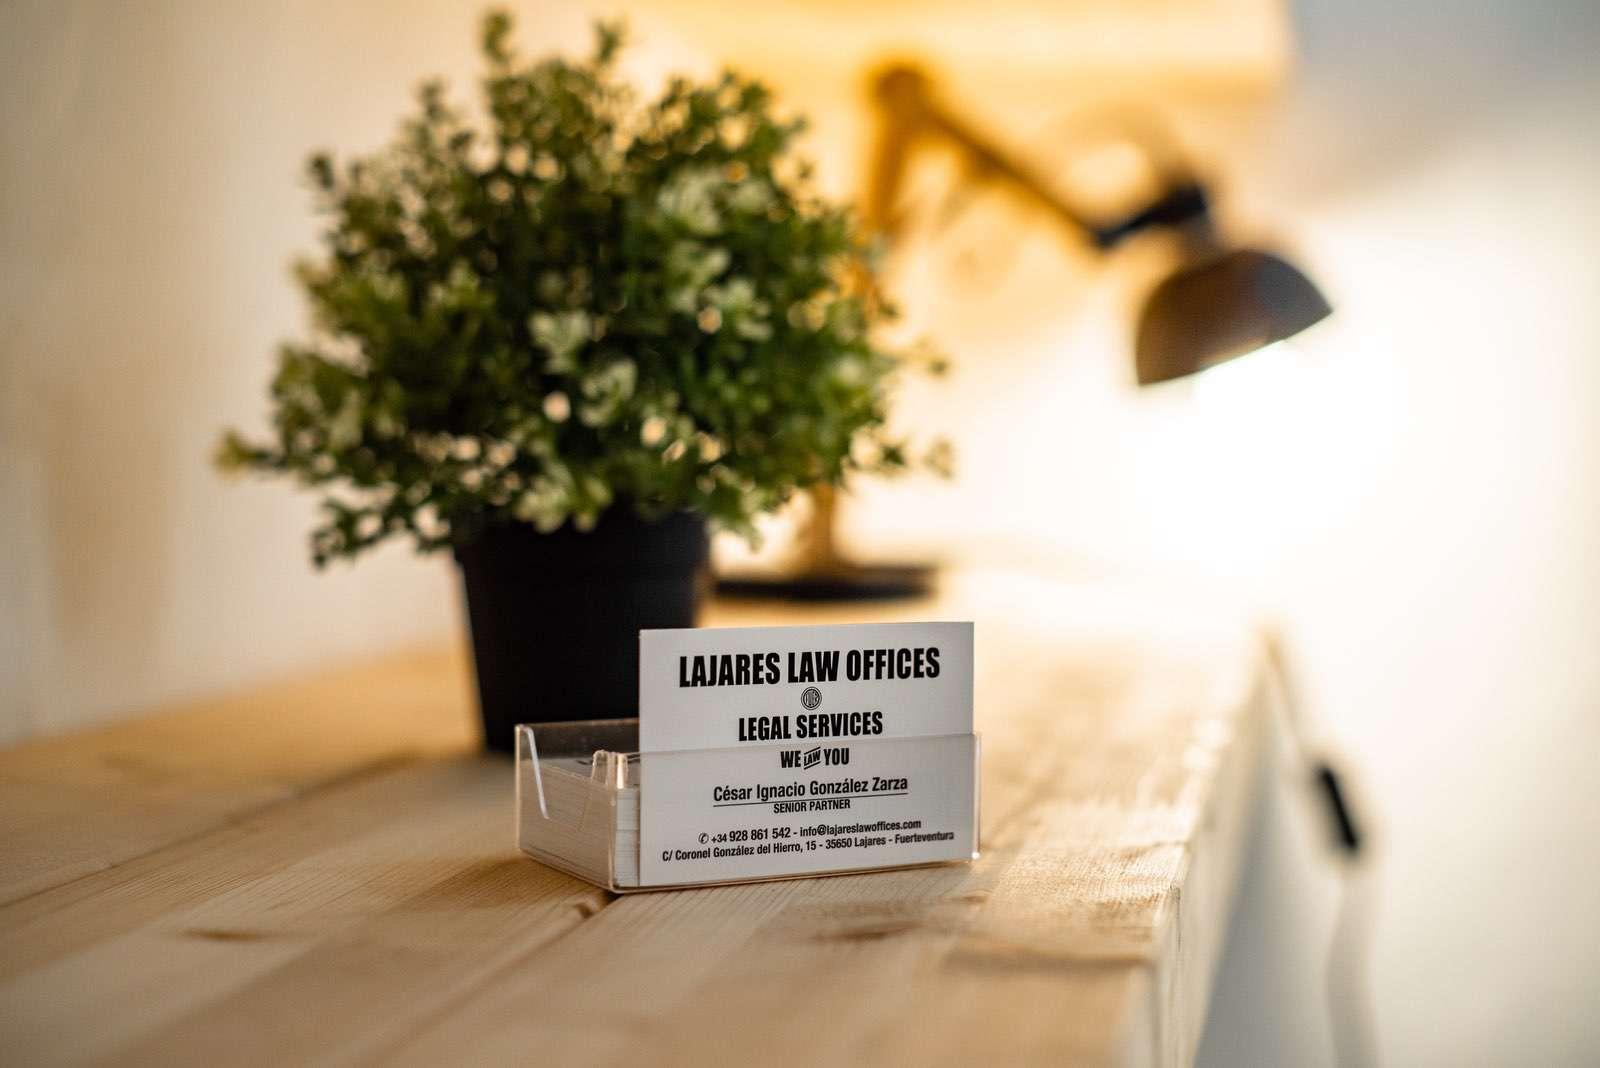 Lajares-law-office-property-taxes-inheritance-fuerteventura-cut